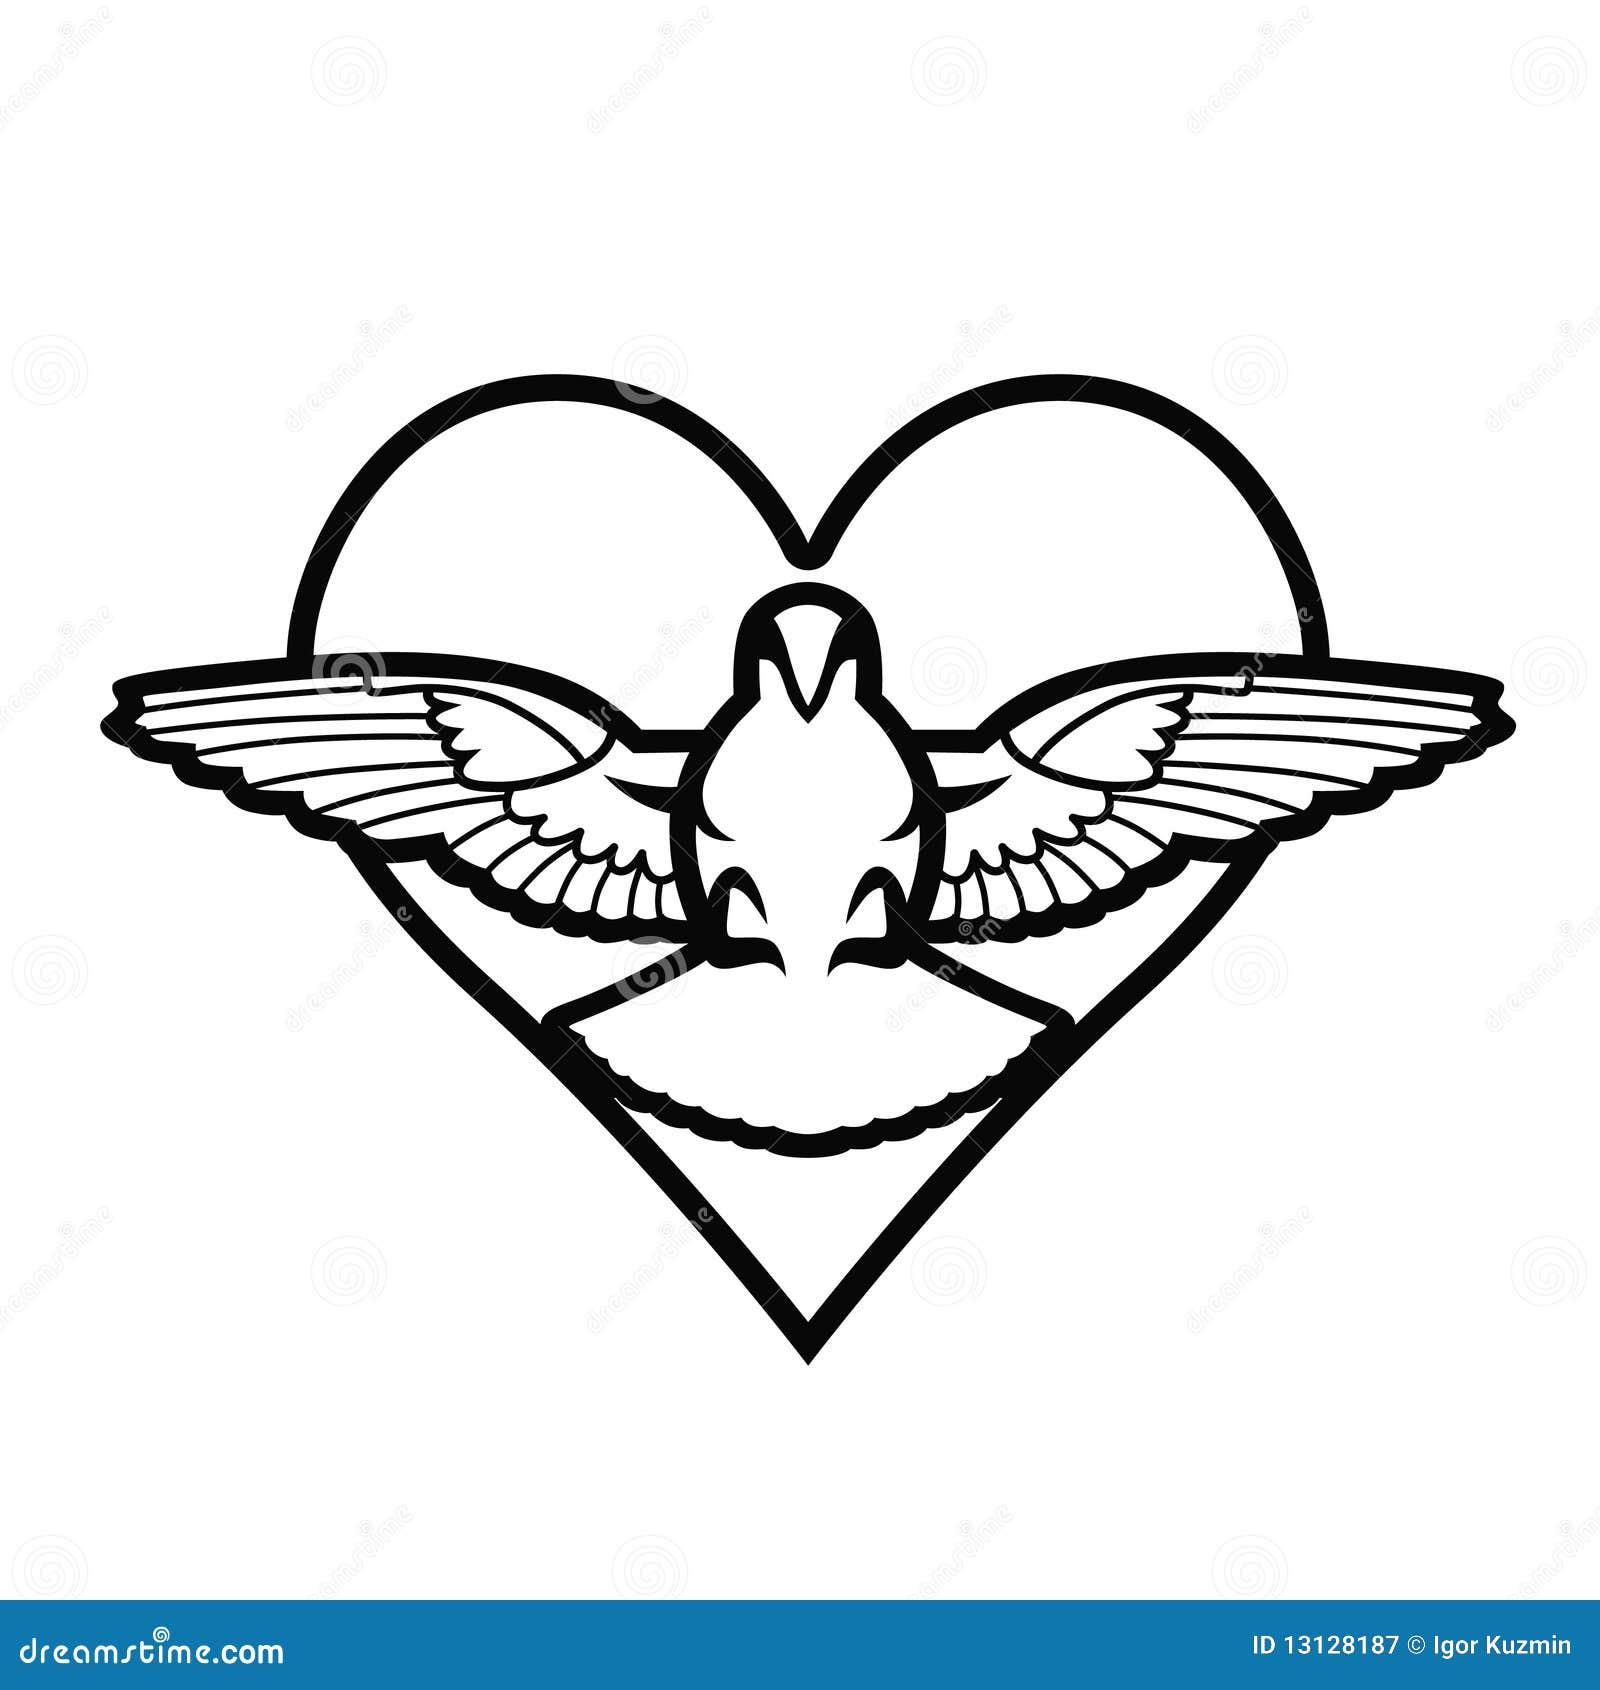 Colombe coeur tatouage photographie stock libre de droits image 13128187 - Image tatouage coeur ...